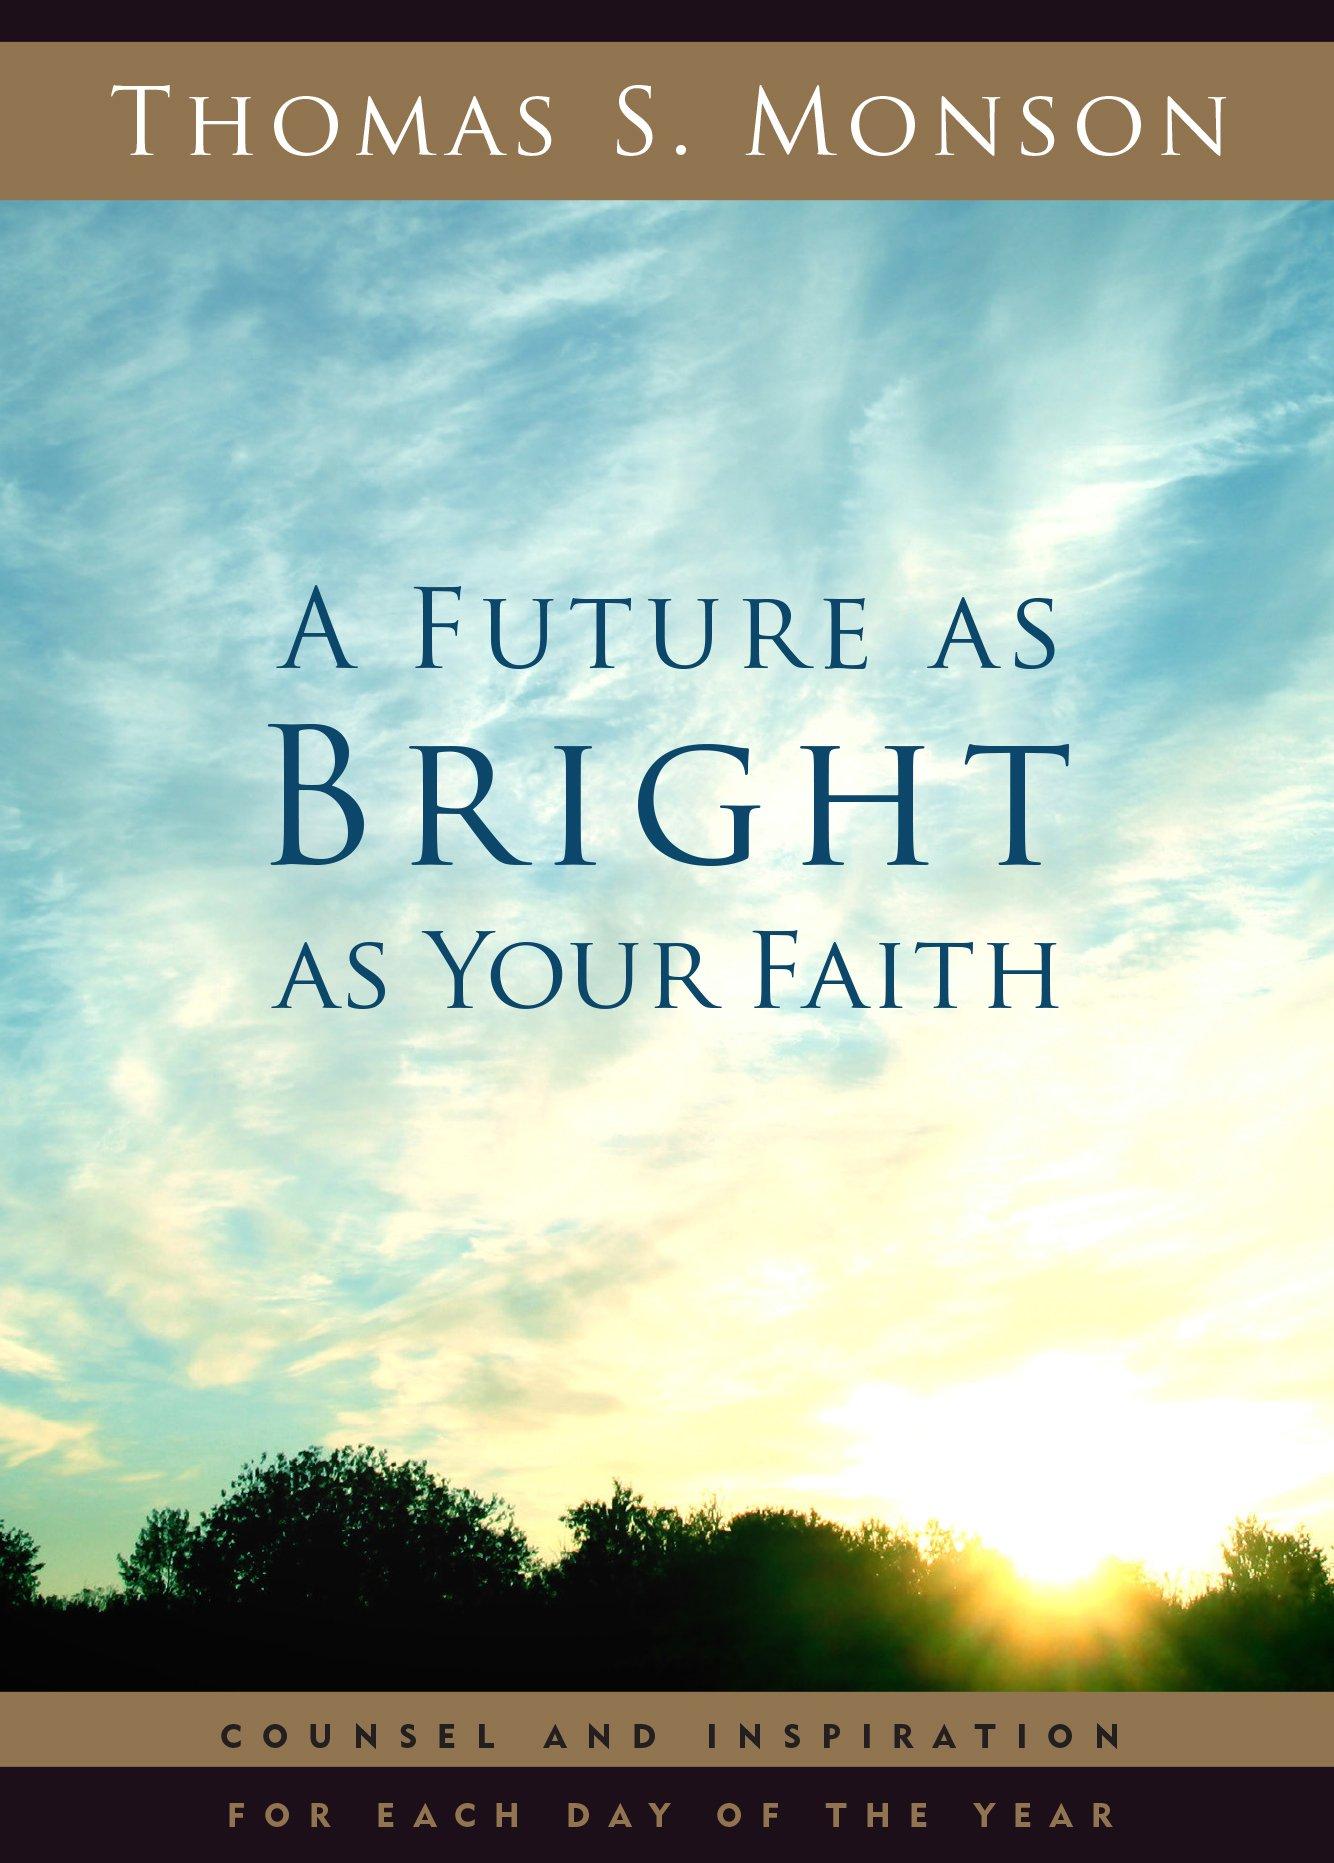 A Future As Bright As Your Faith Thomas S Monson 9781629721132